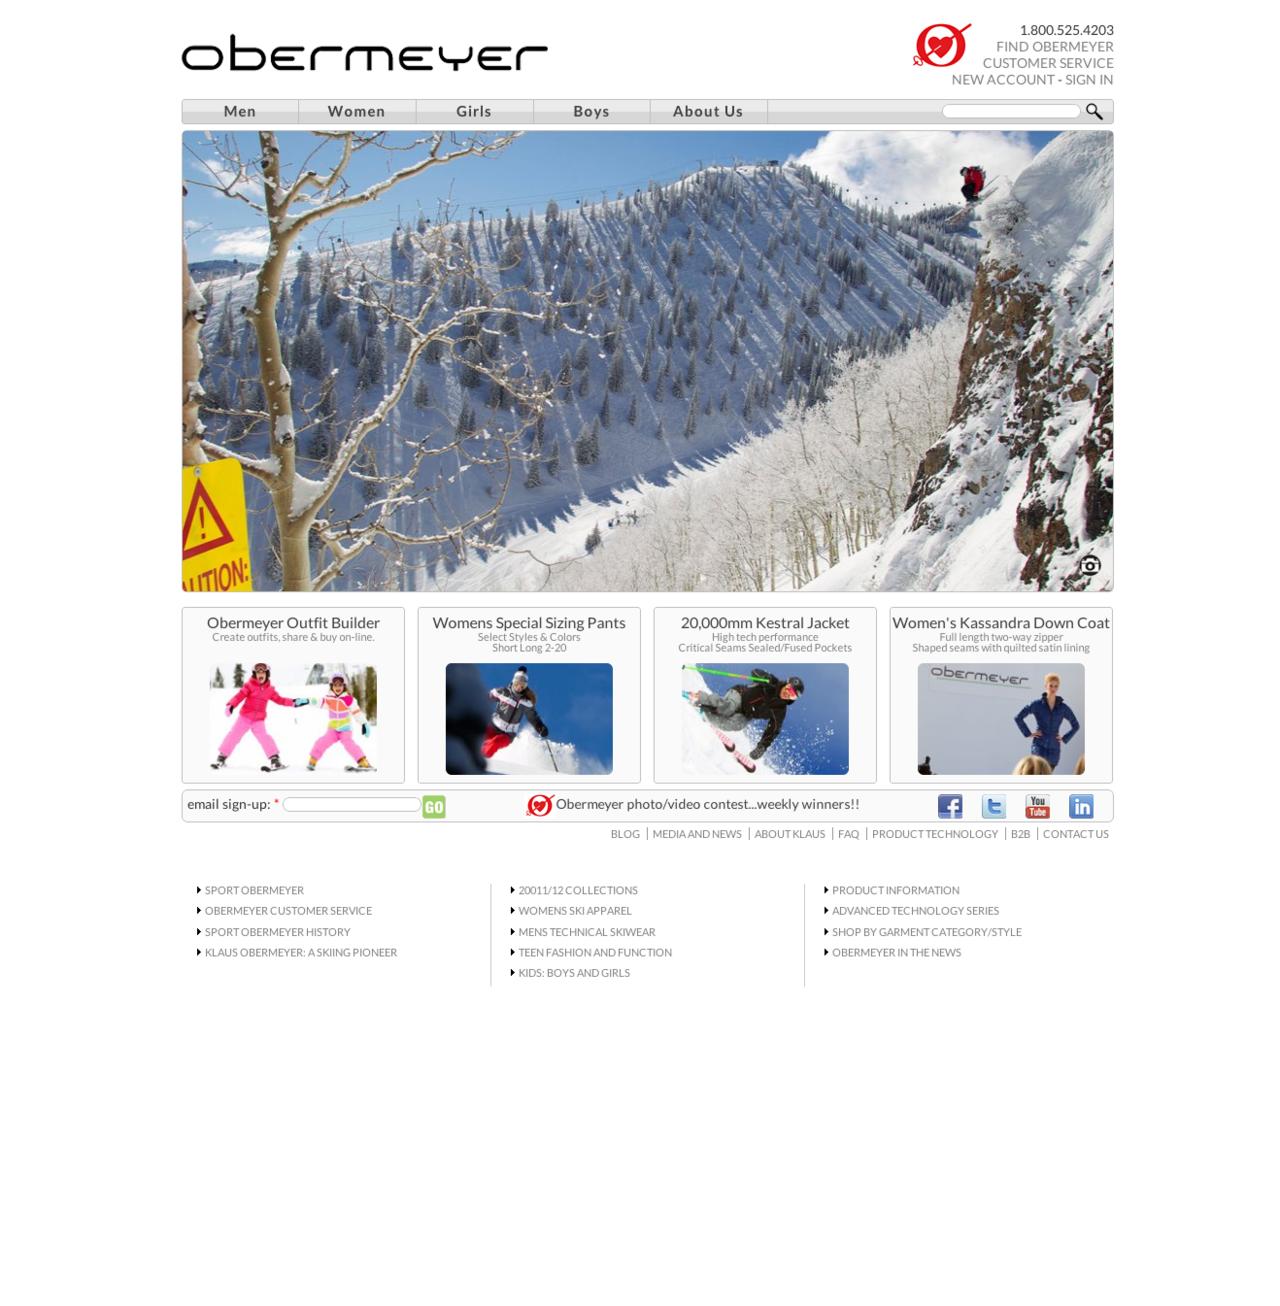 www.obermeyer.com